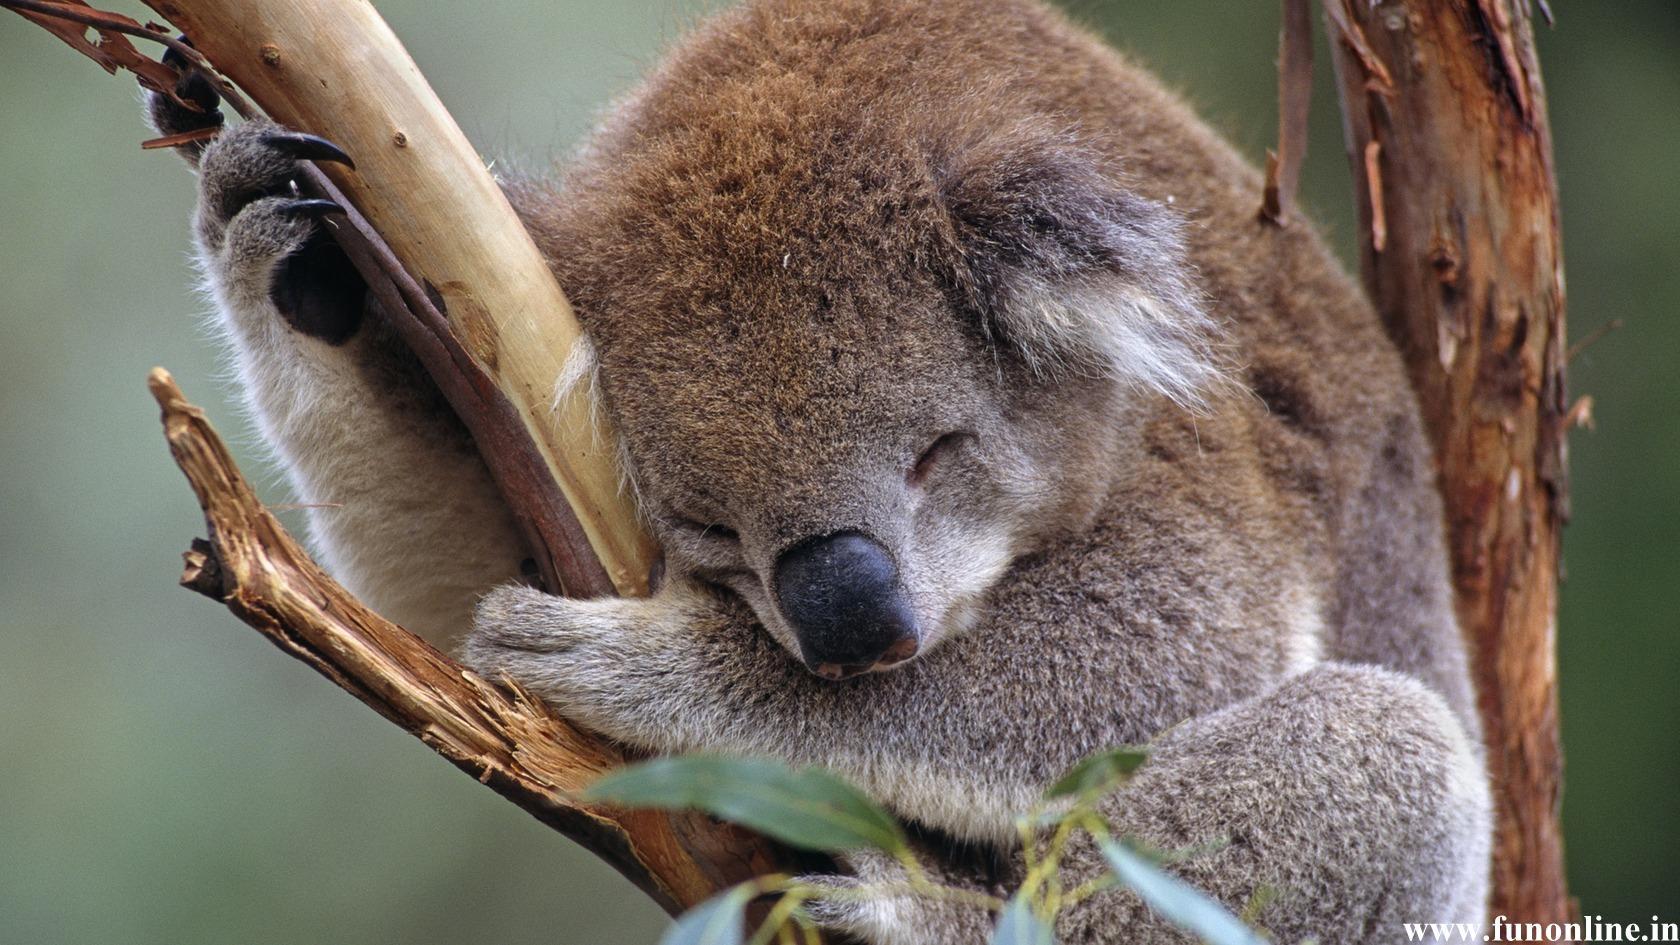 Koala Wallpapers Download Cute and Pretty Koalas HD Wallpaper 1680x945